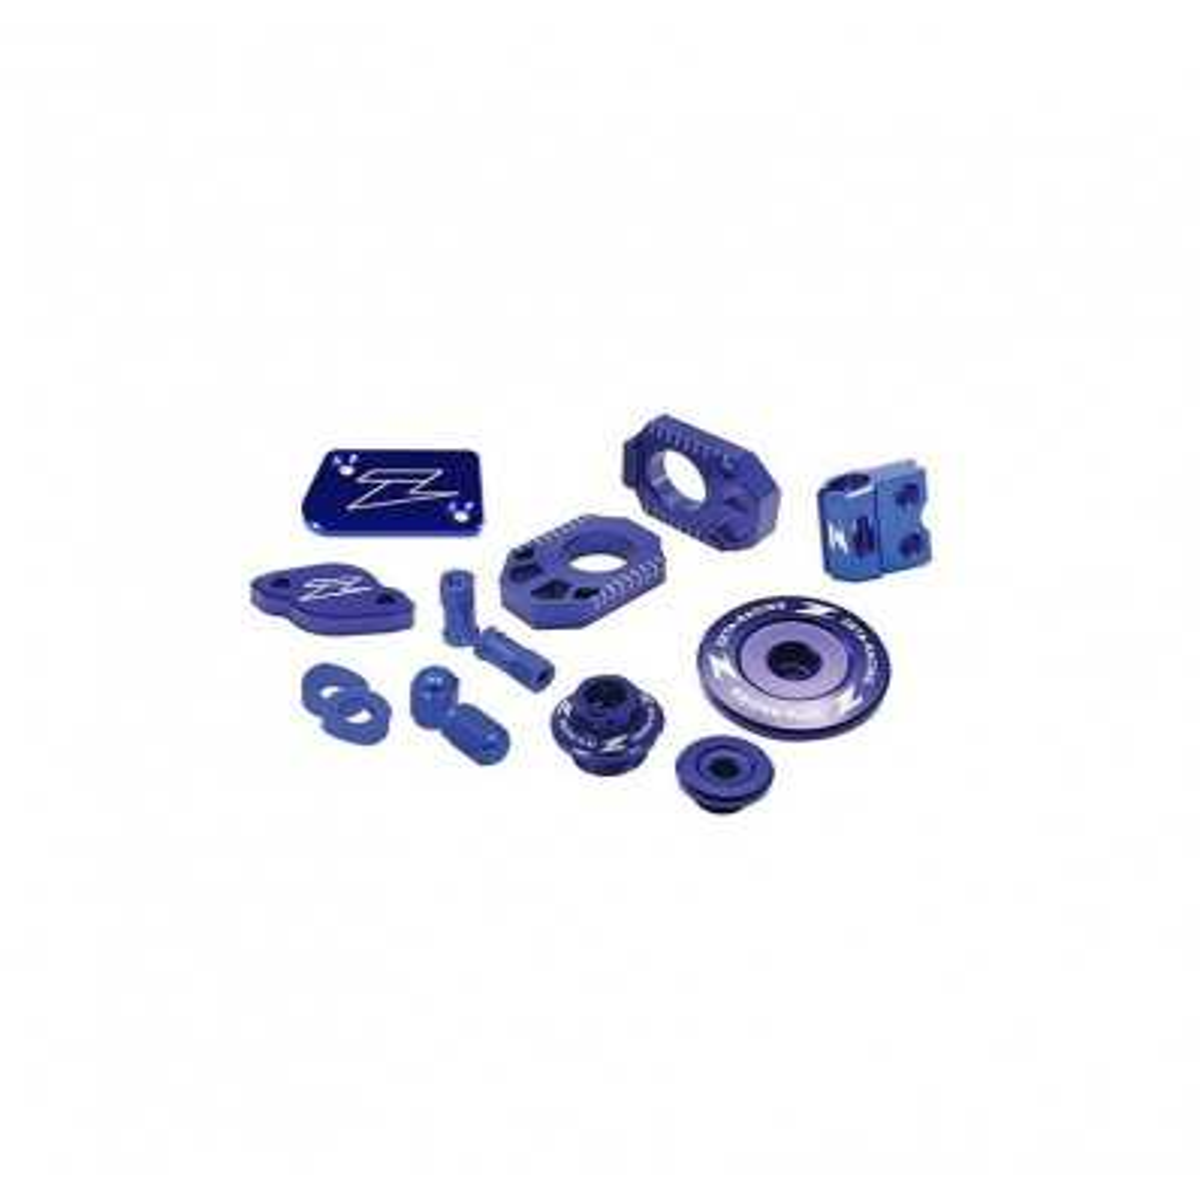 ZE51.2346 - Kit Completo Yamaha Yz250F Yz450F´14 Azul